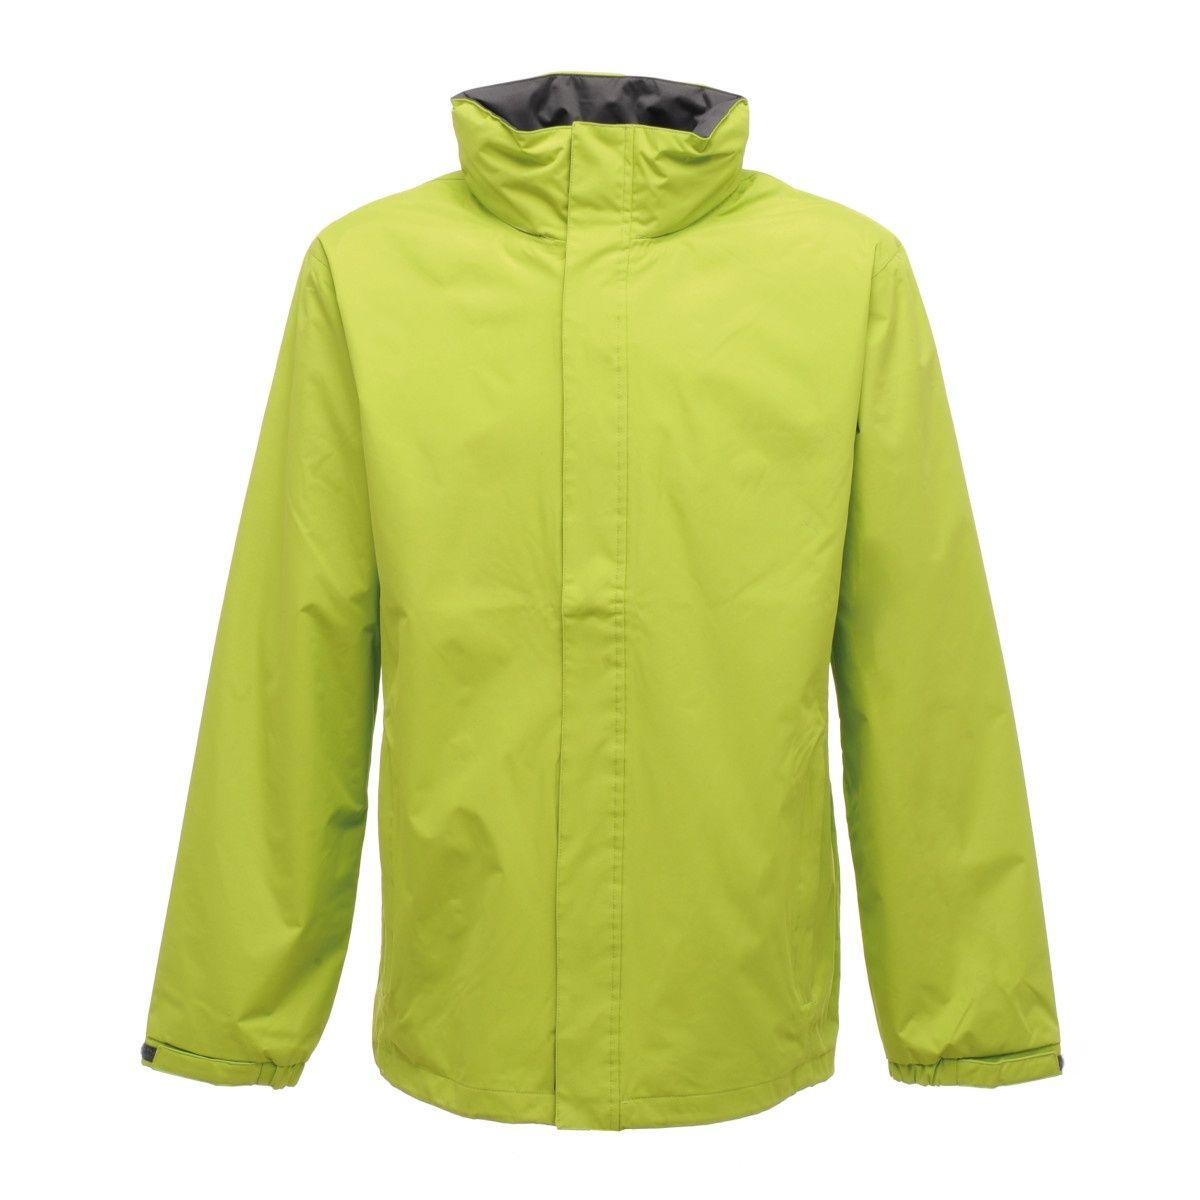 Regatta Mens Standout Ardmore Jacket (Waterproof & Windproof) (Key Lime/Seal Grey)